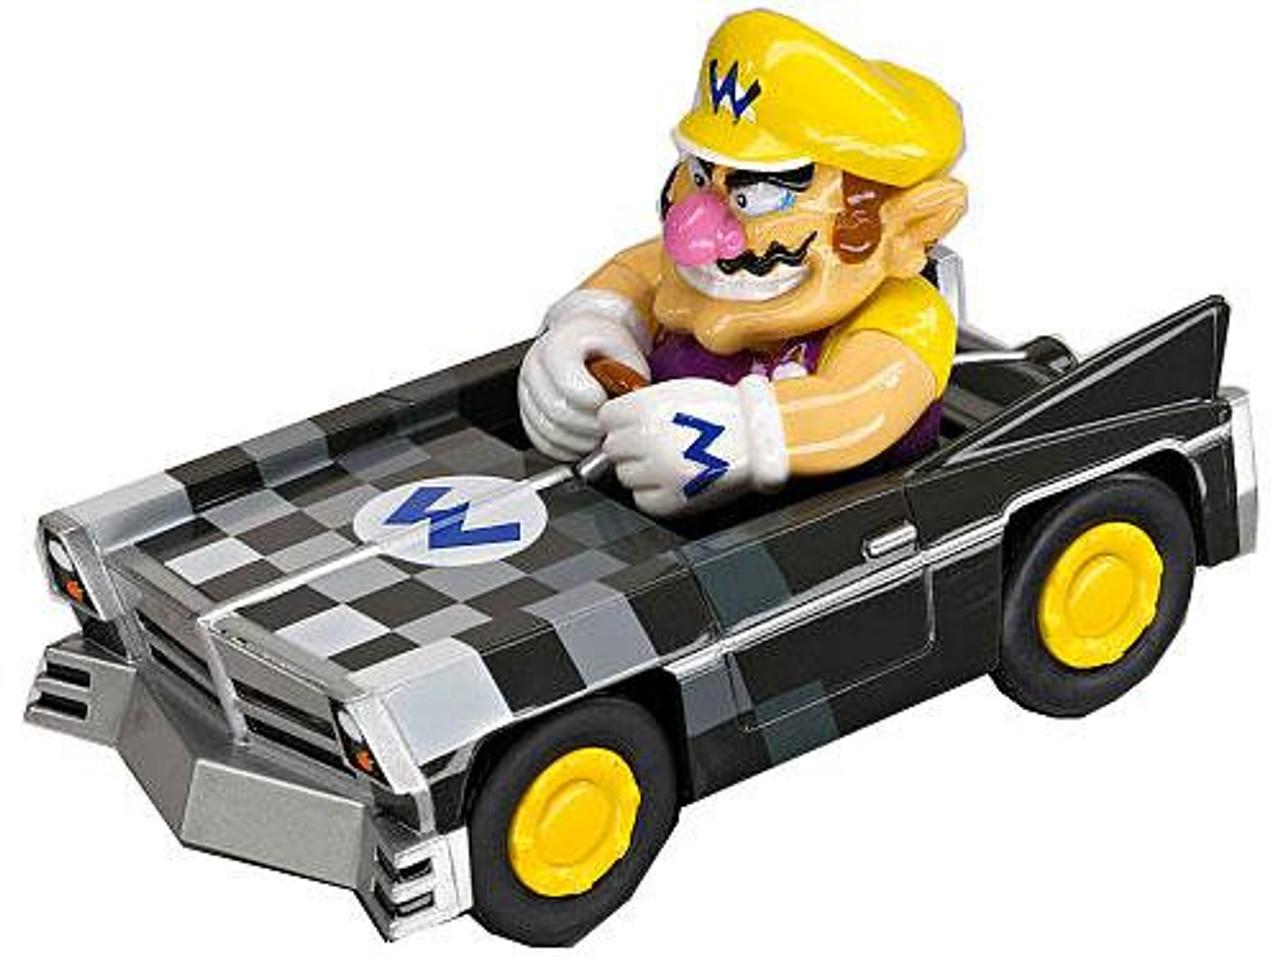 Super Mario Mario Kart DS Pull & Speed Wario Brute 3.5-Inch Vehicle #19302